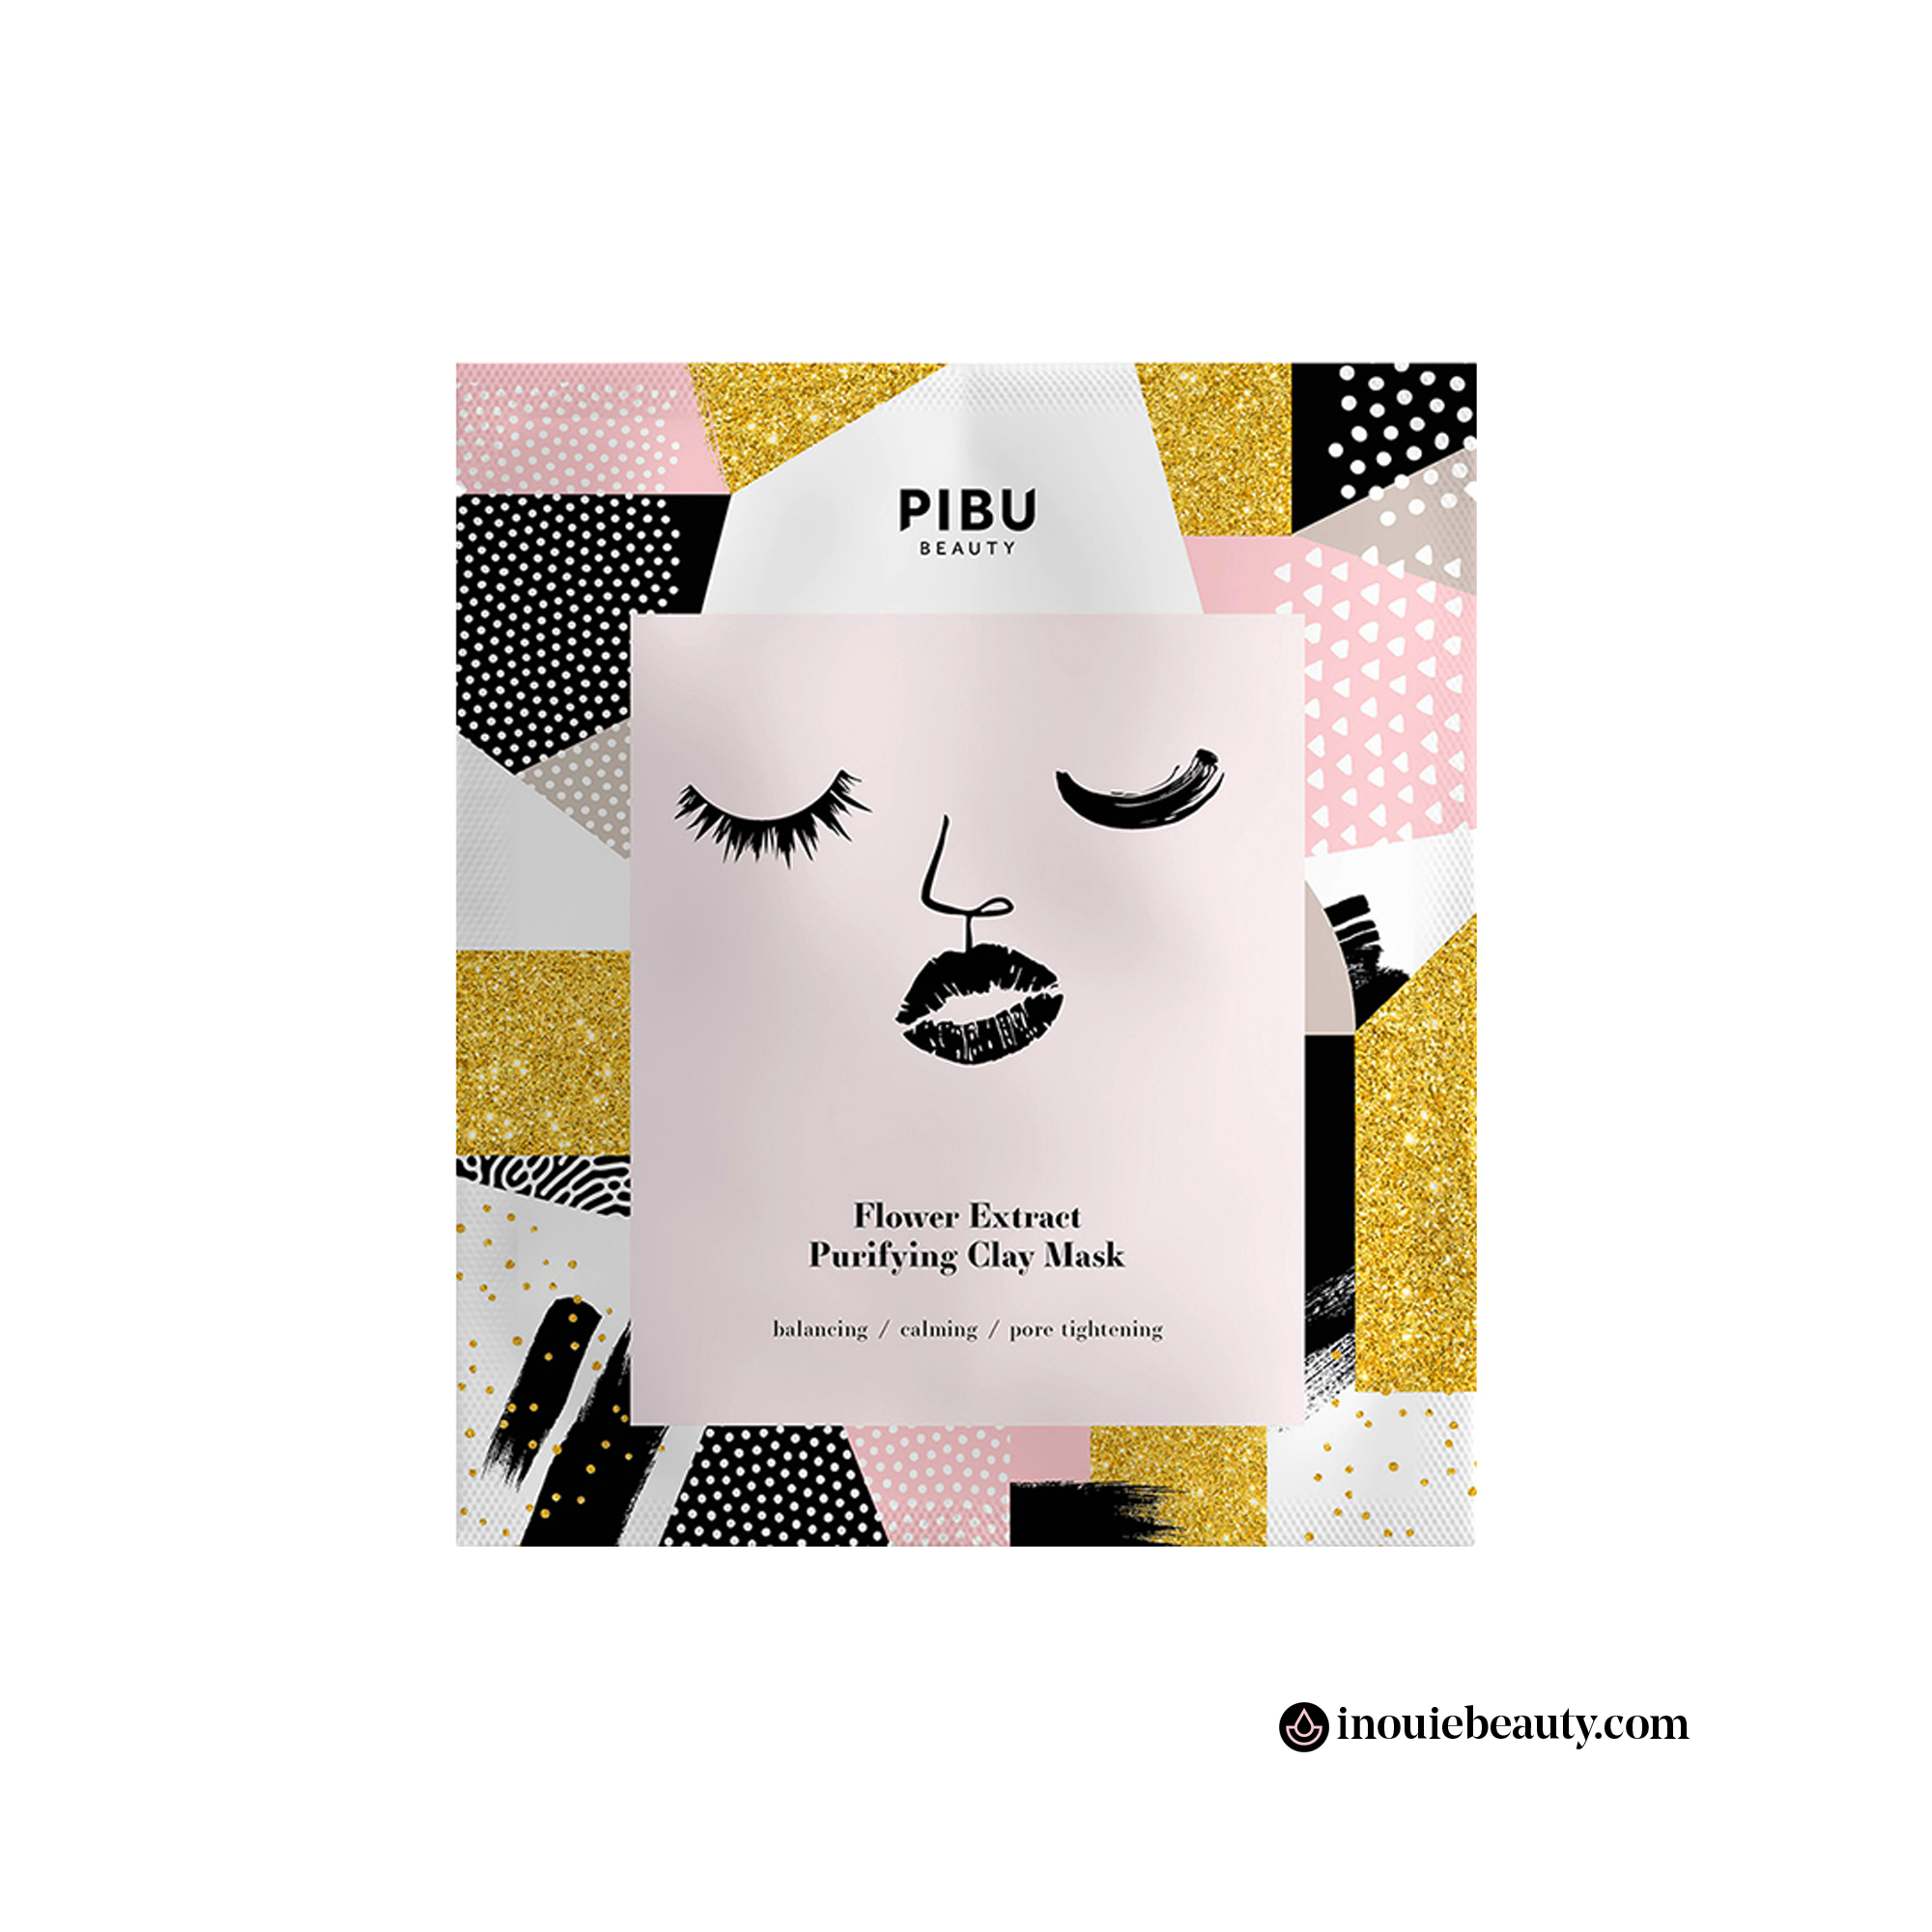 Pibu Beauty Flower Extract Purifying Clay Mask